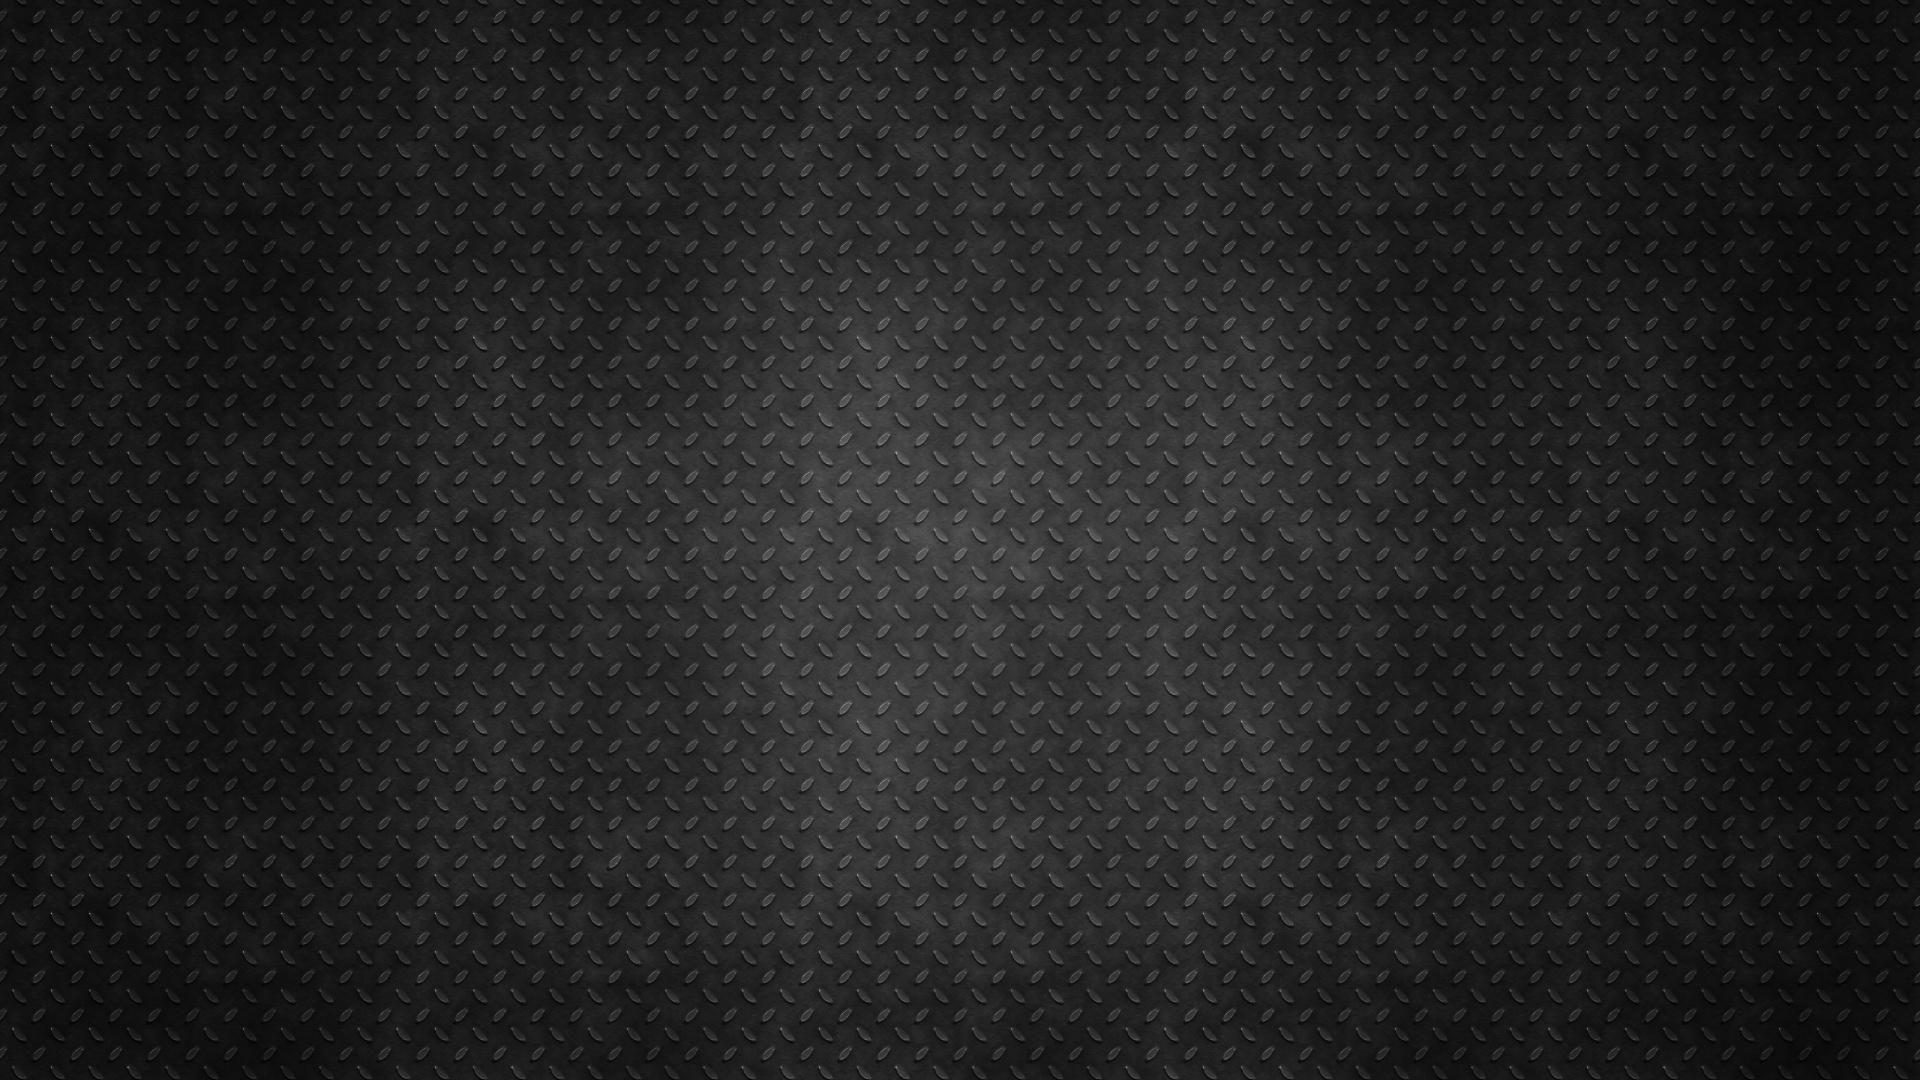 Img 106353 Jpg 1920 1080 Black Wallpaper Pure Black Wallpaper Metal Texture